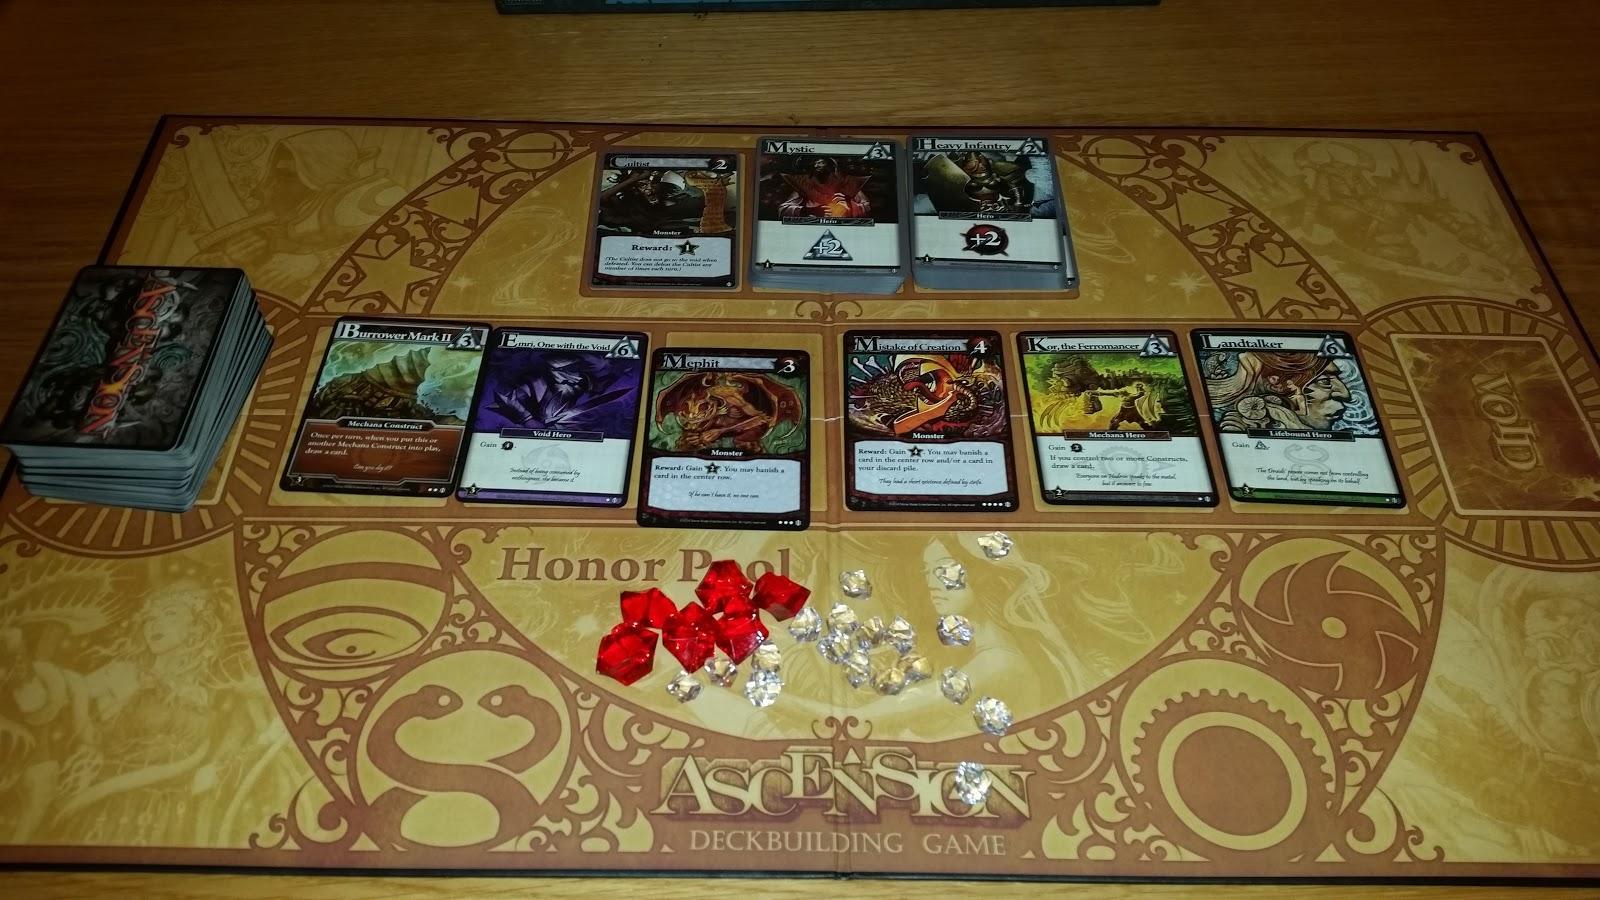 Dragonfire Deck Building Game Review